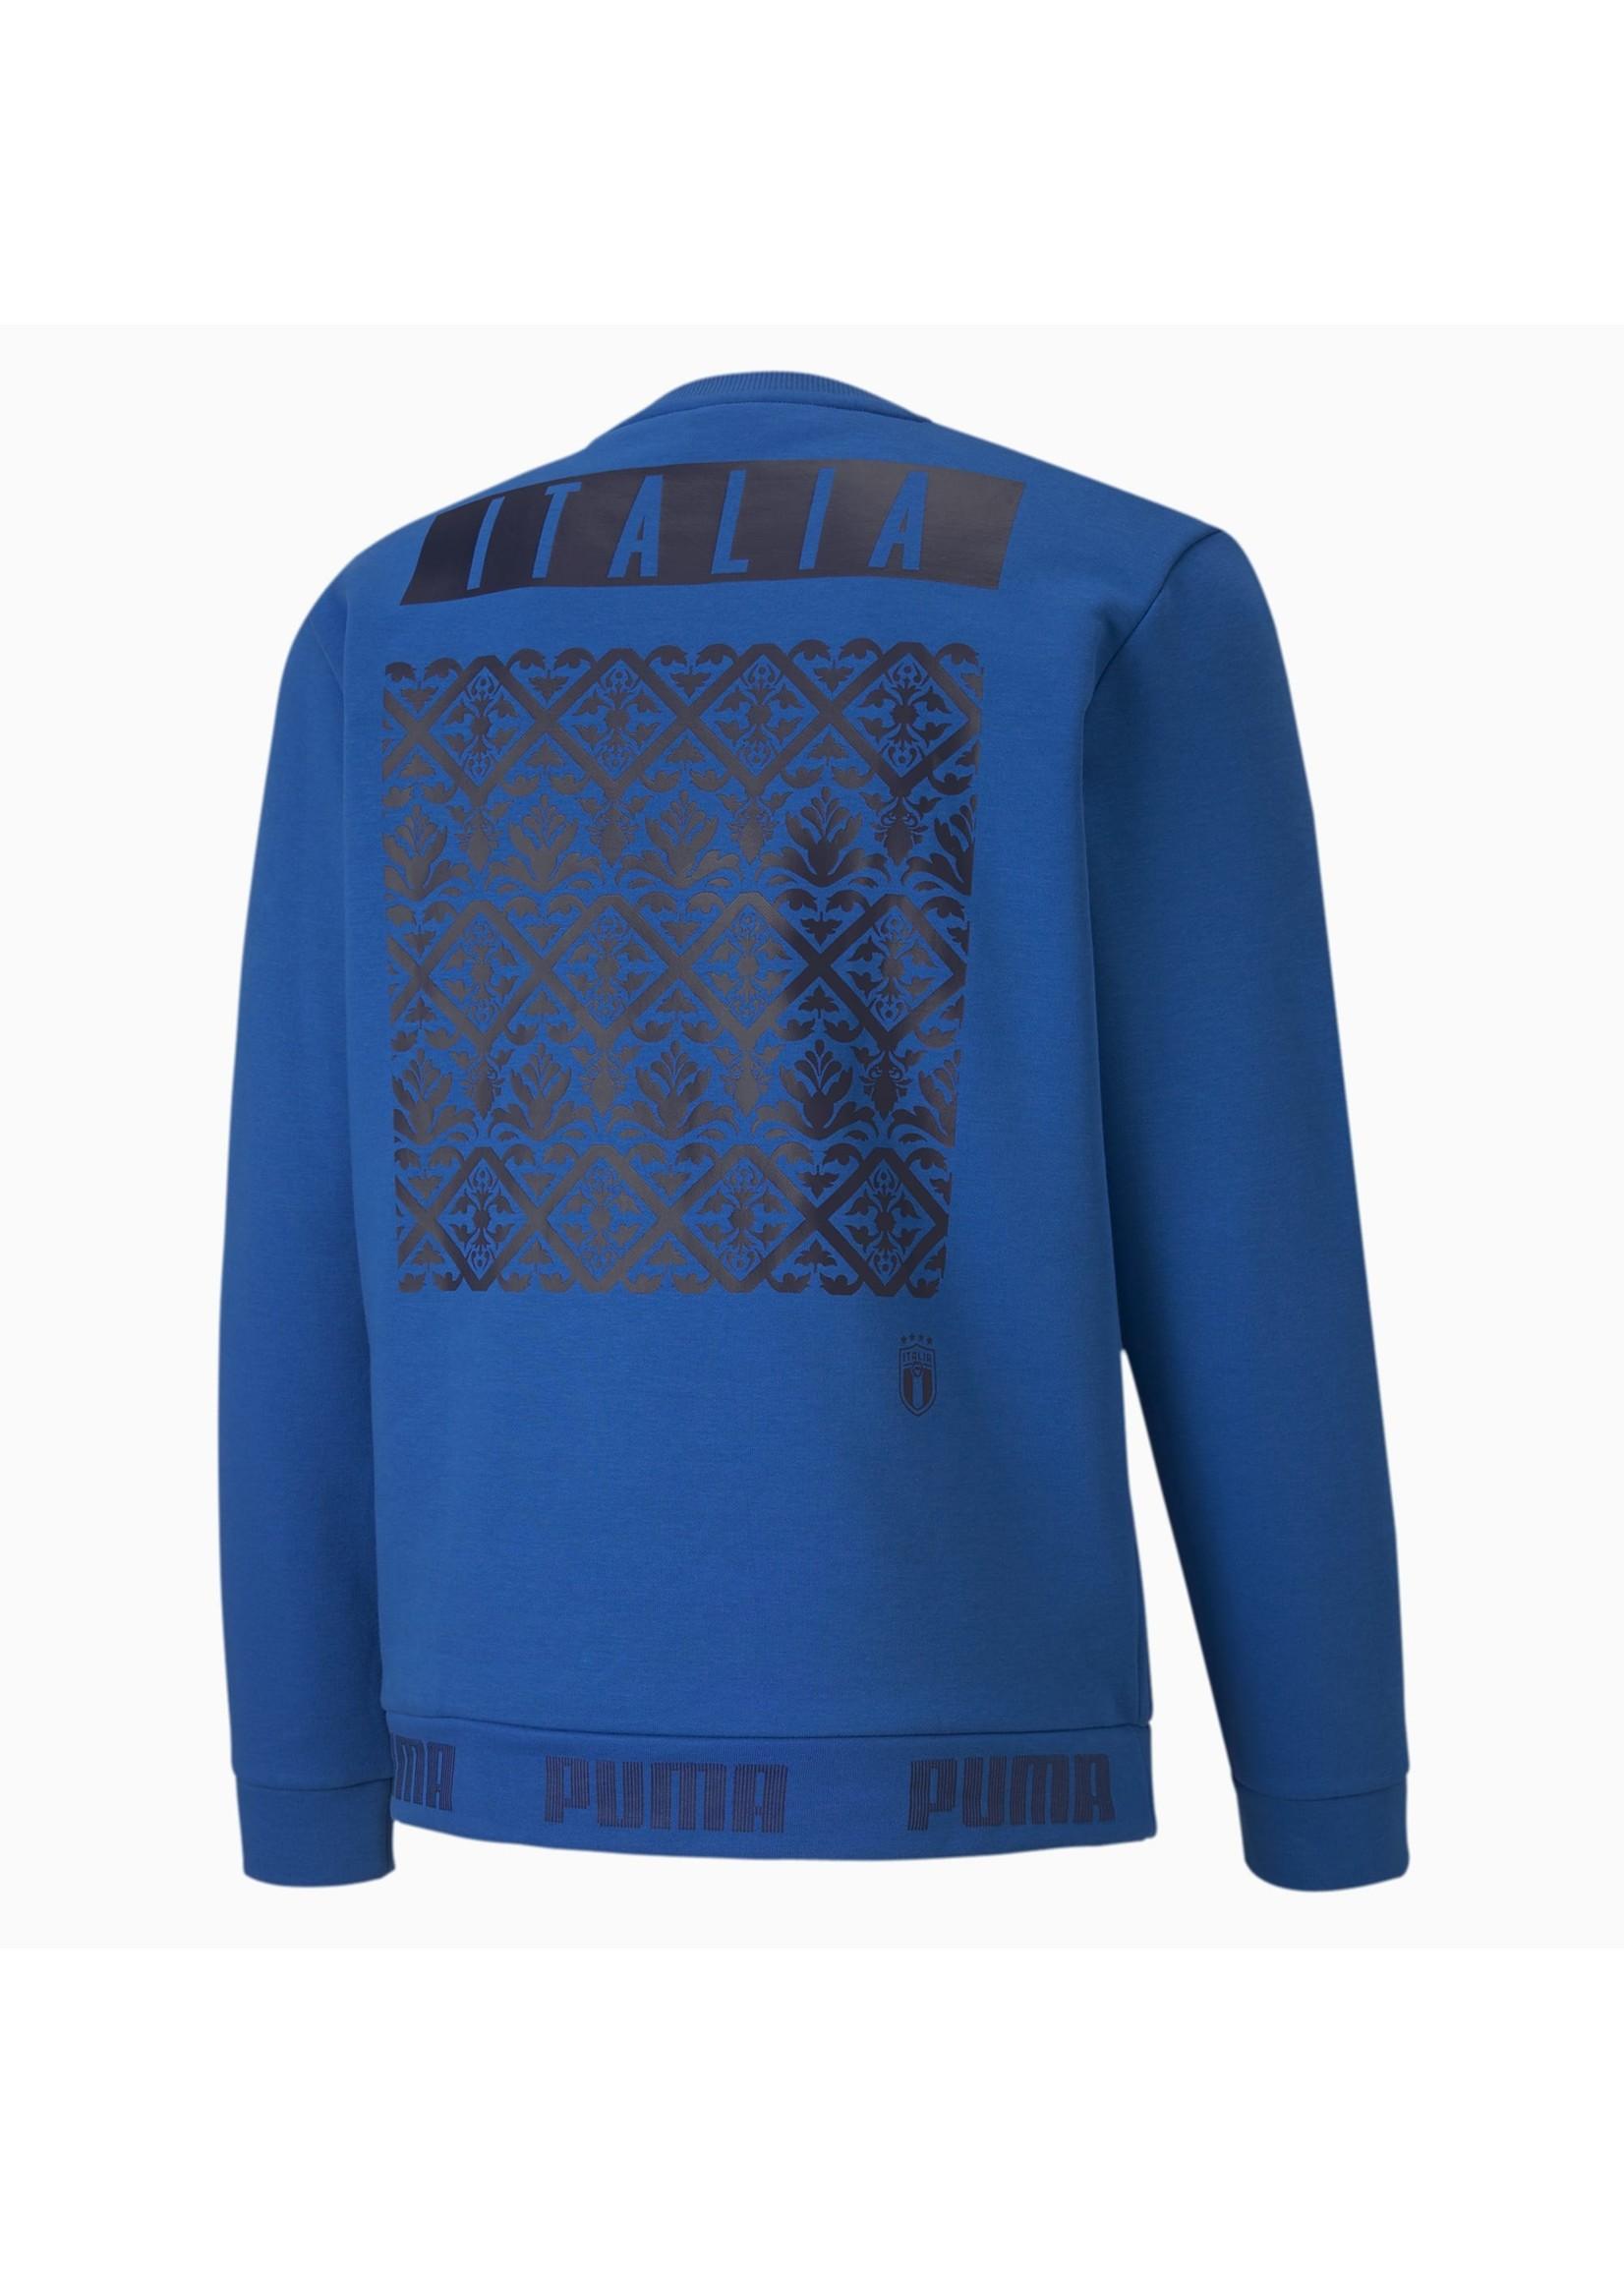 Puma Italy Sweatshirt - Euro 2020 Home